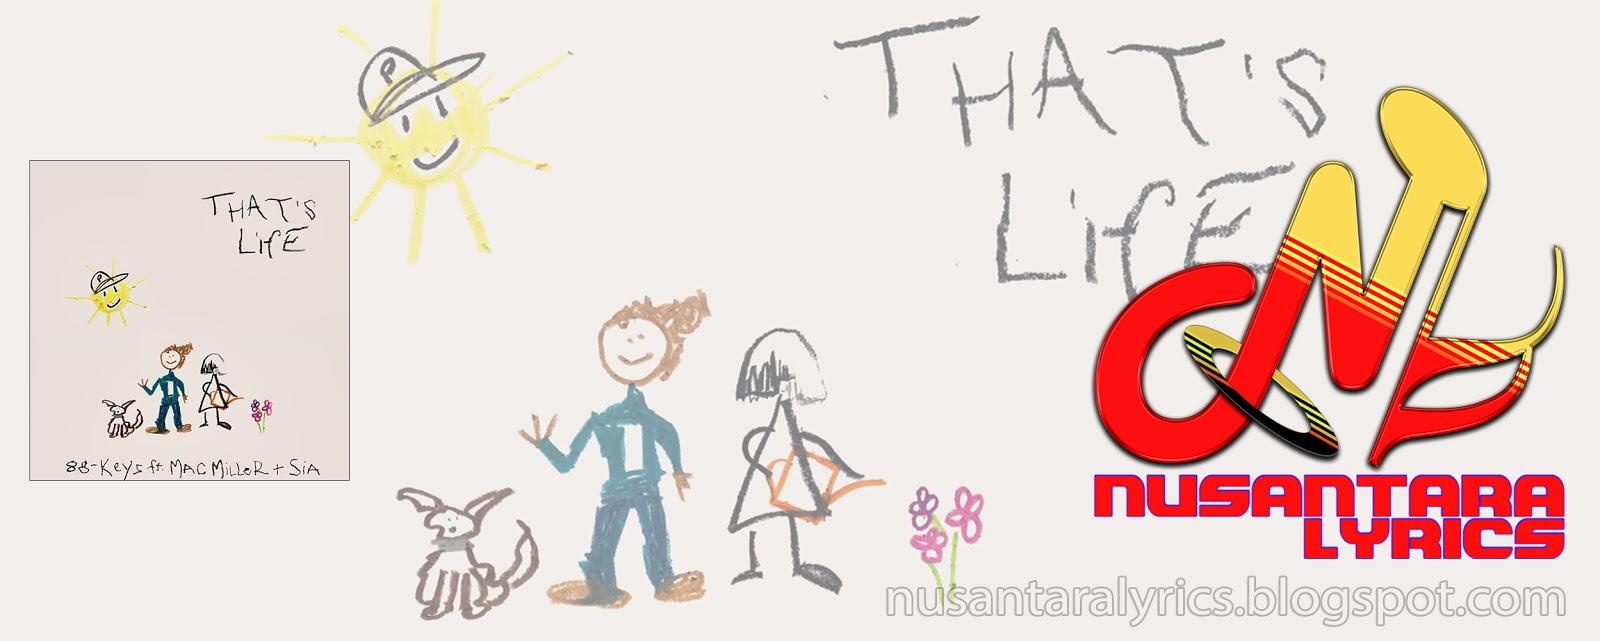 thats life mac miller